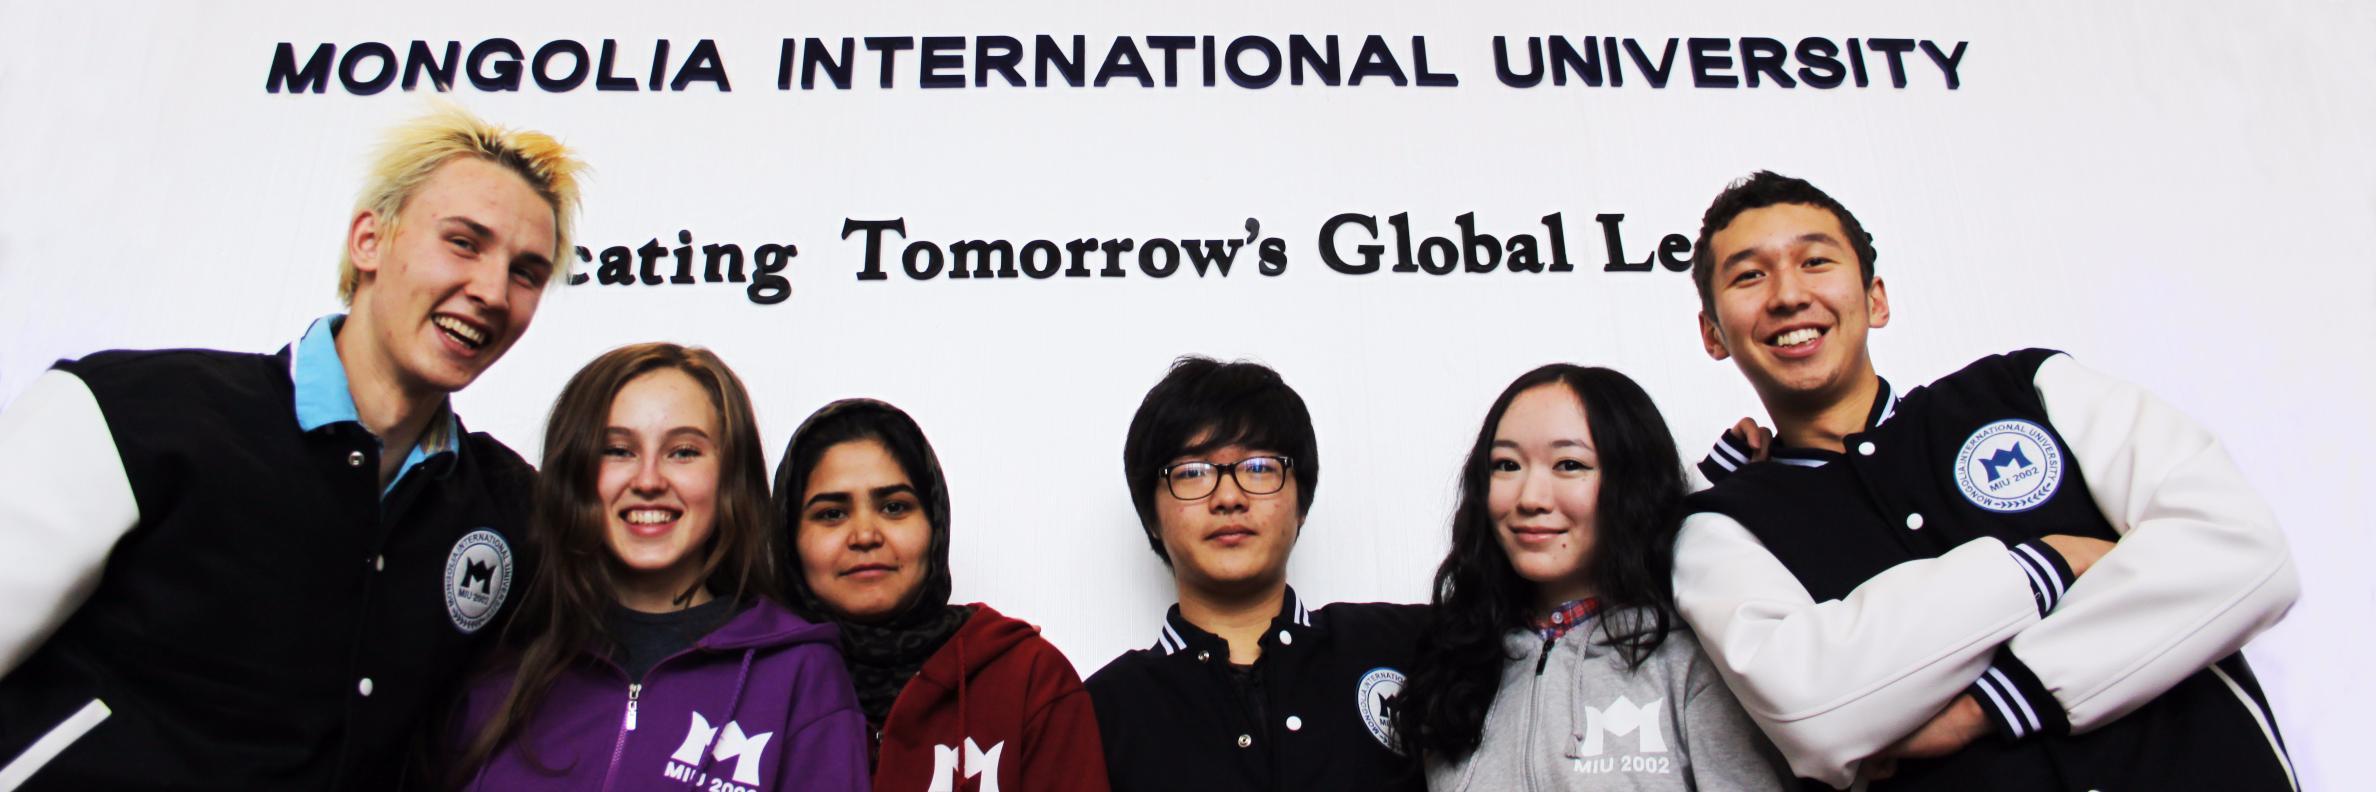 Mongolia International University's official Twitter account